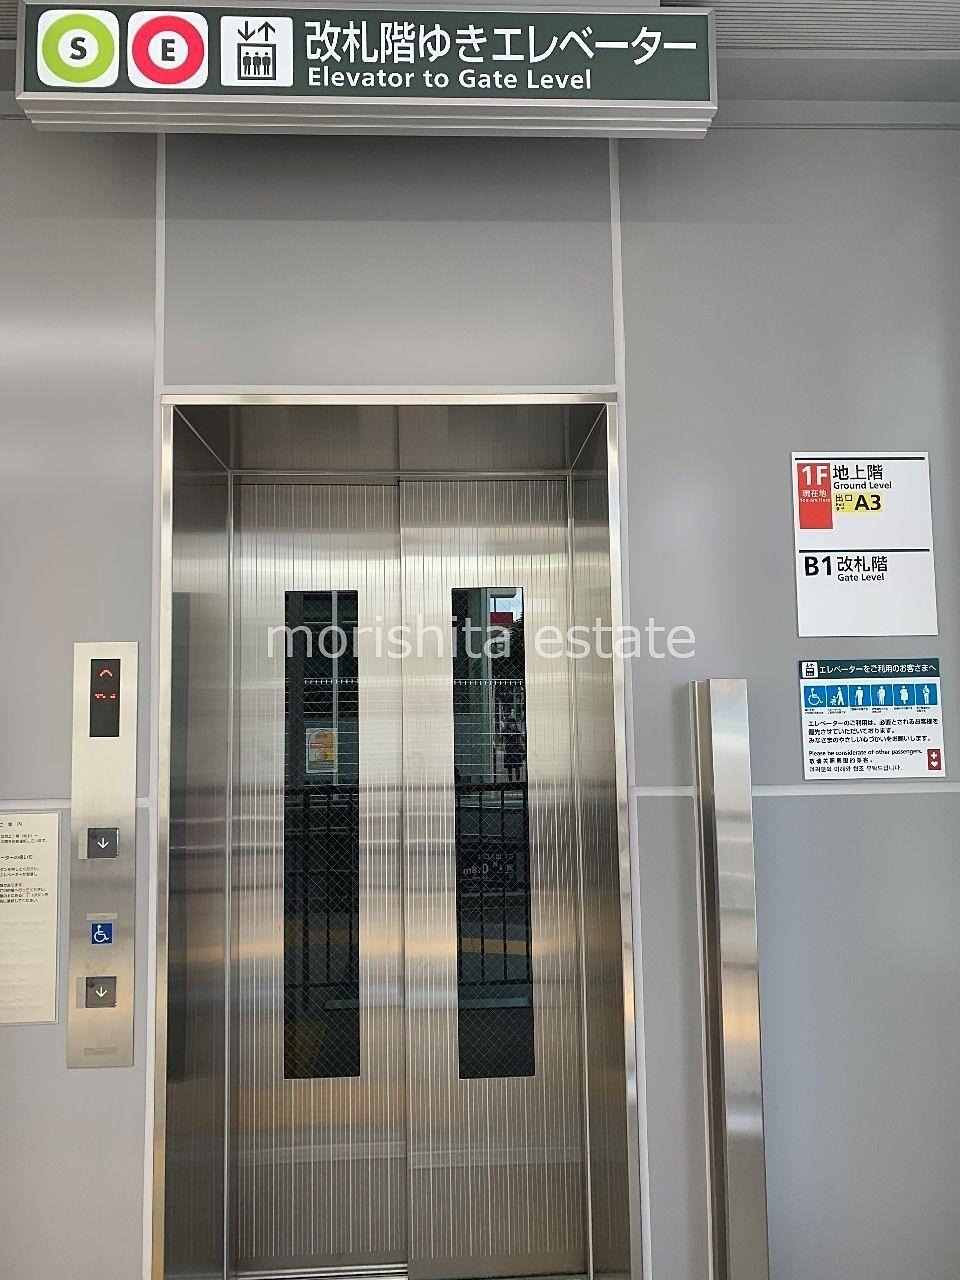 大江戸線 新宿線 森下駅 A3出口 エレベーター 写真